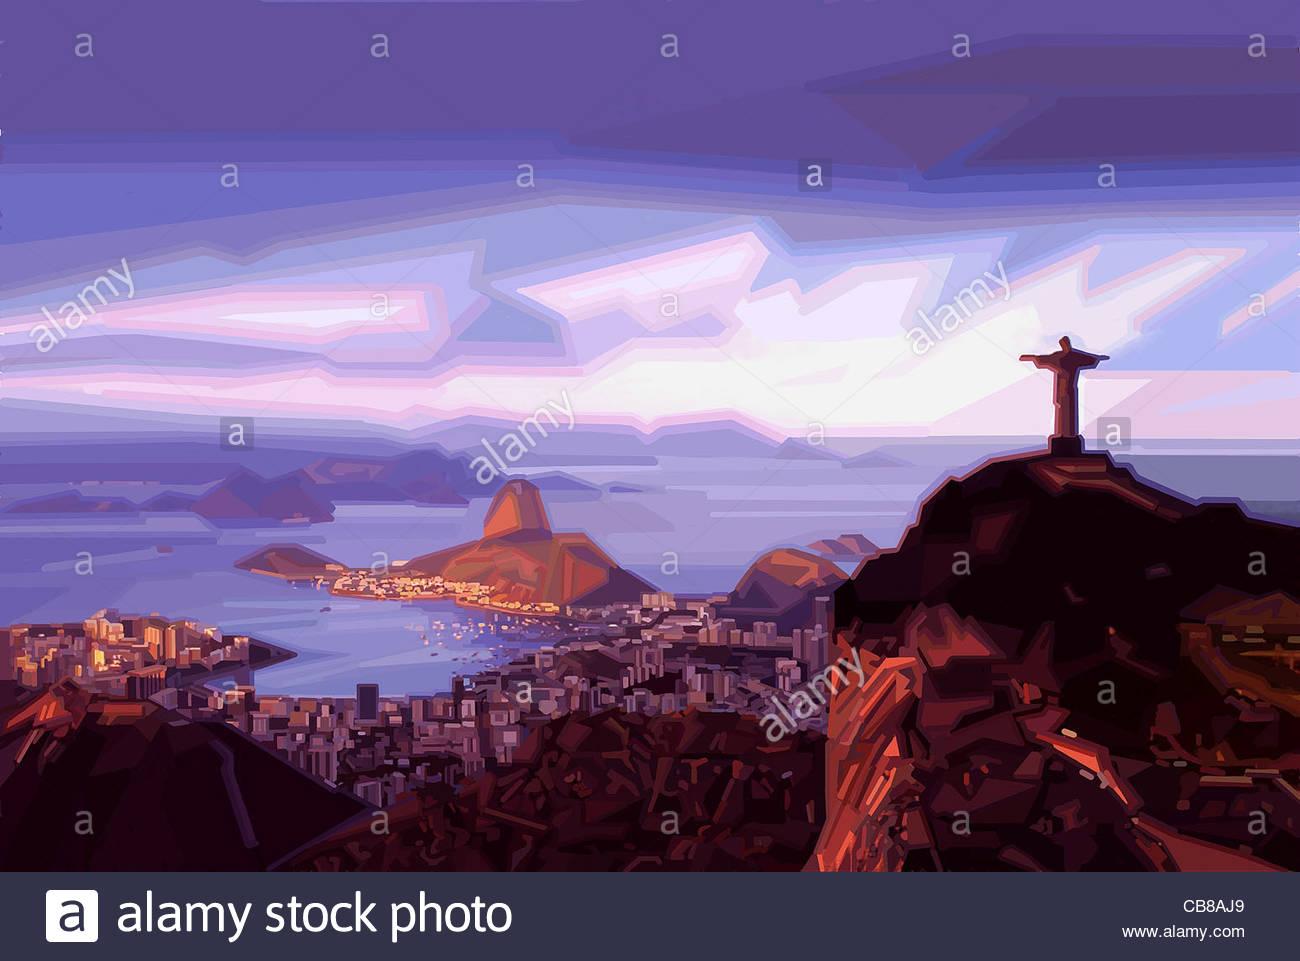 Serie città di Rio de Janeiro il carnevale città urban urbanità città in città Immagini Stock